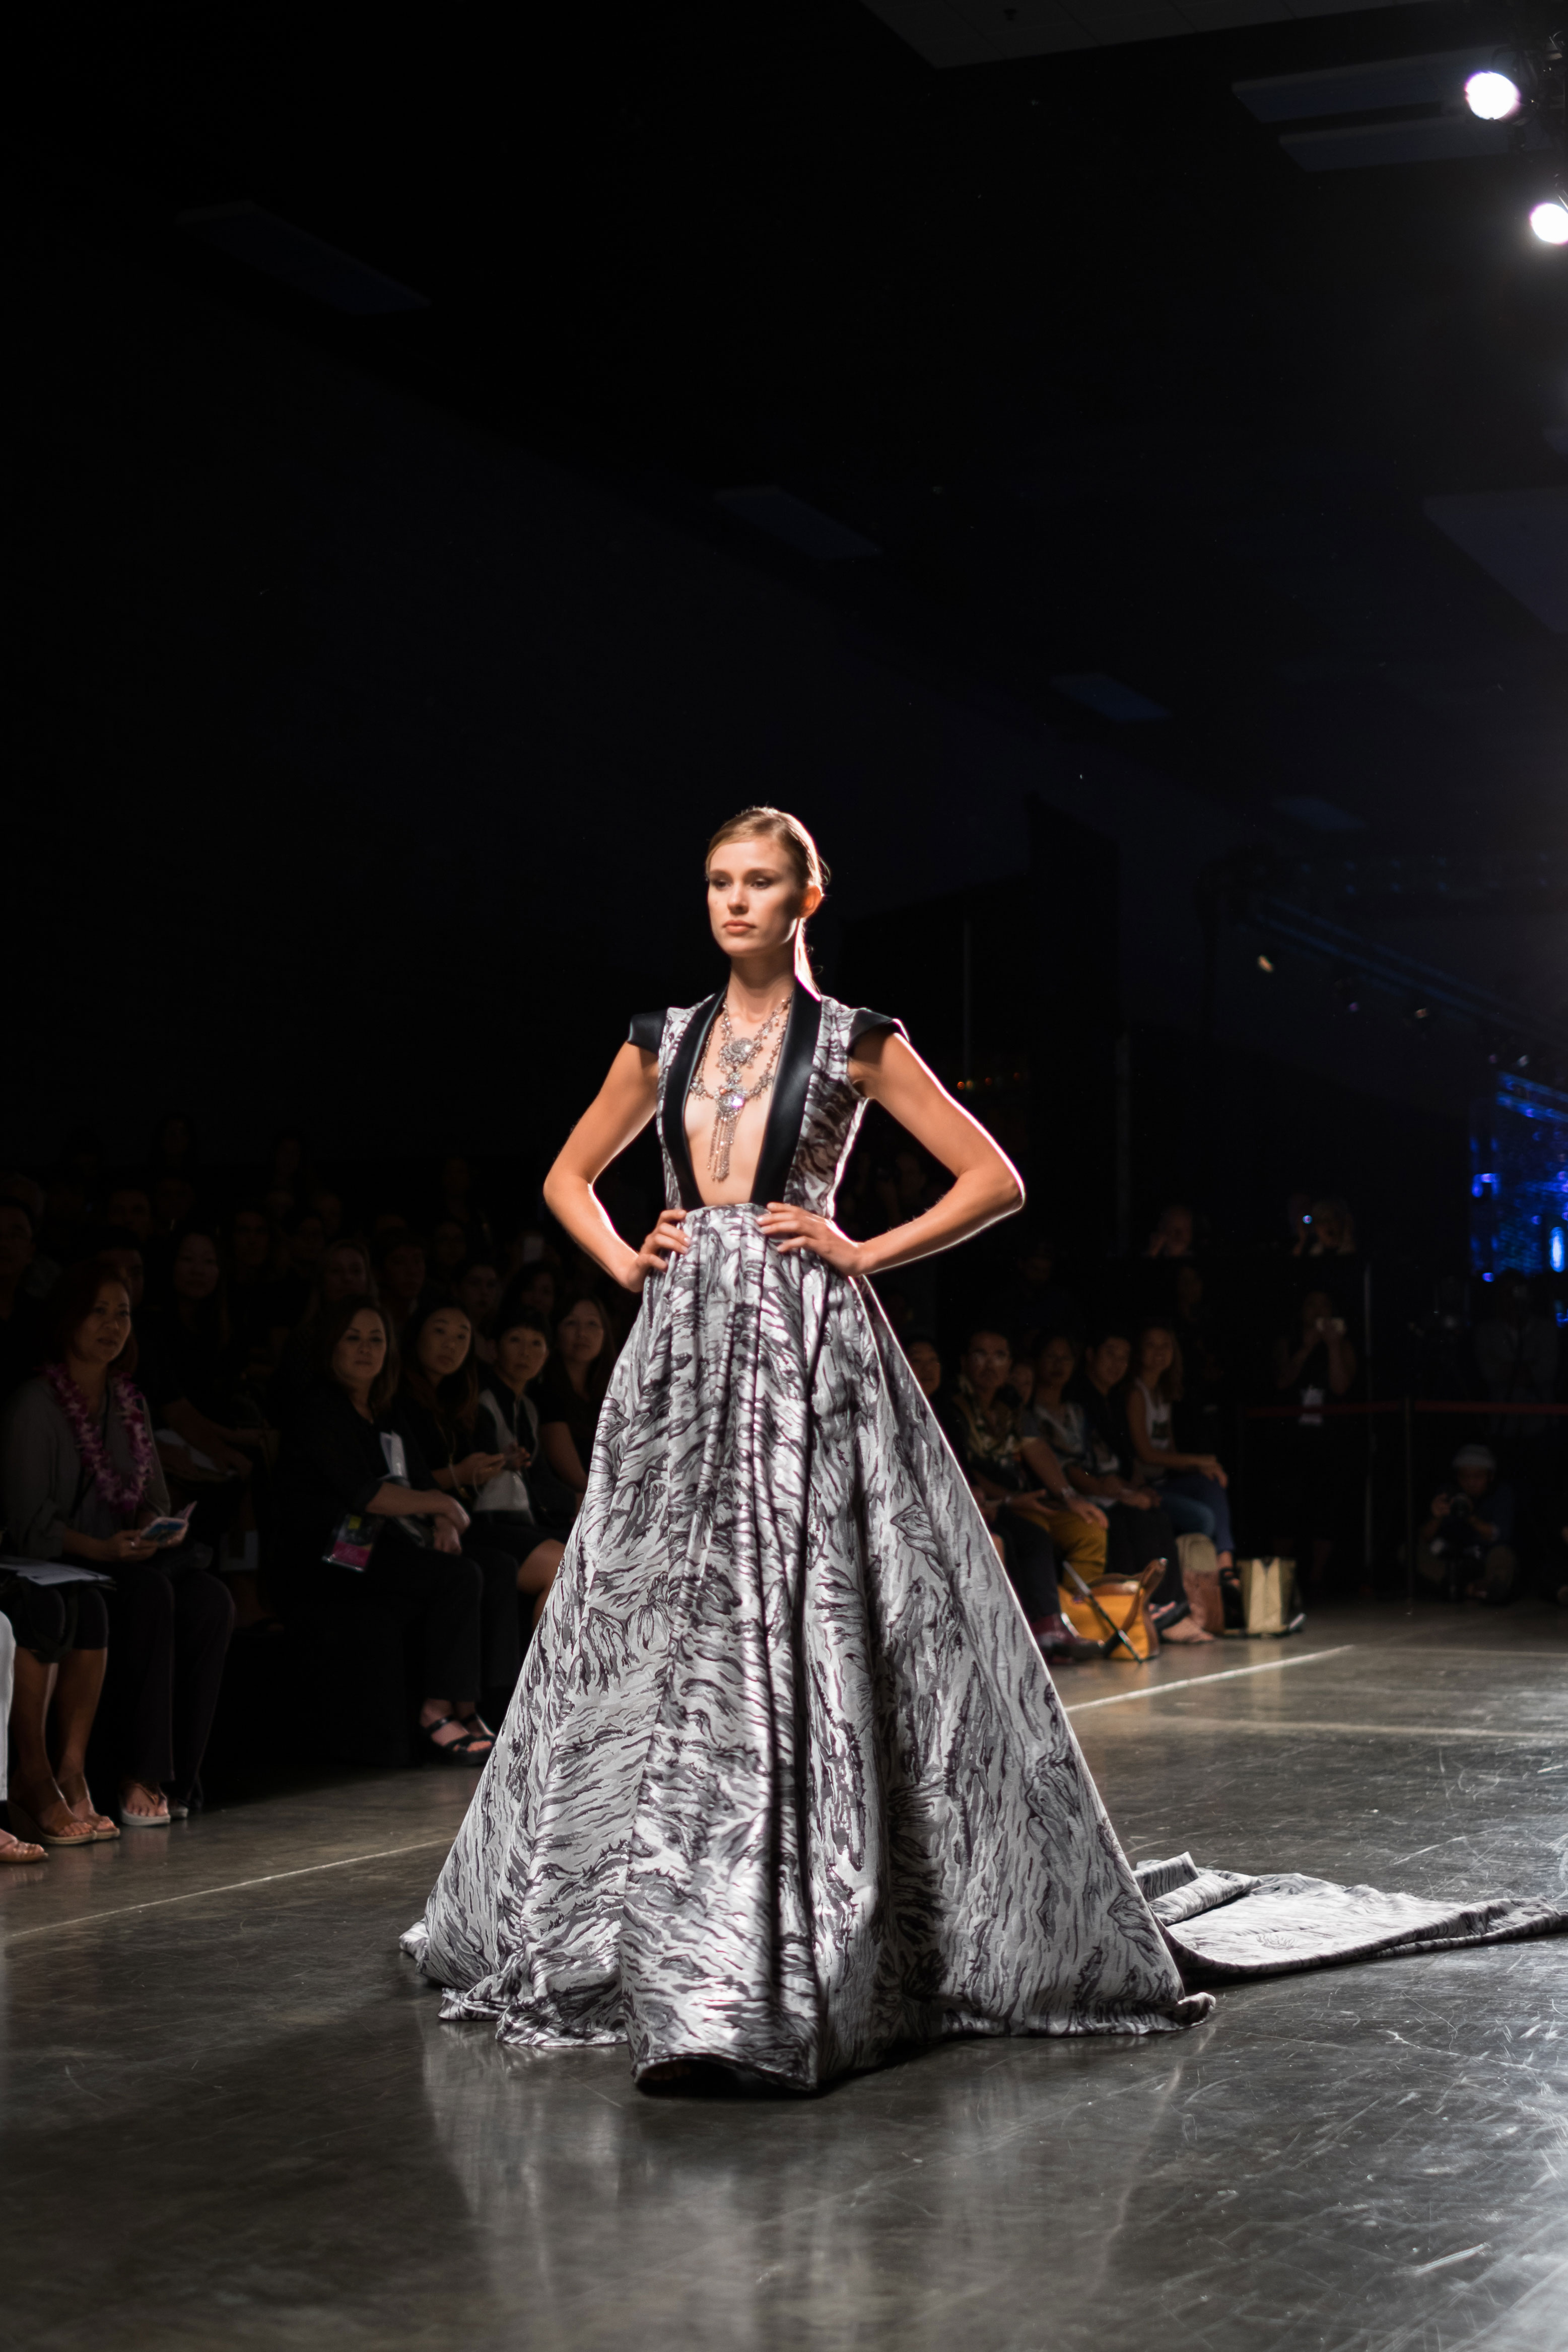 Keke Lindgard in Kojo Couture design. PC: Gary Saito/HONOLULU Fashion Week